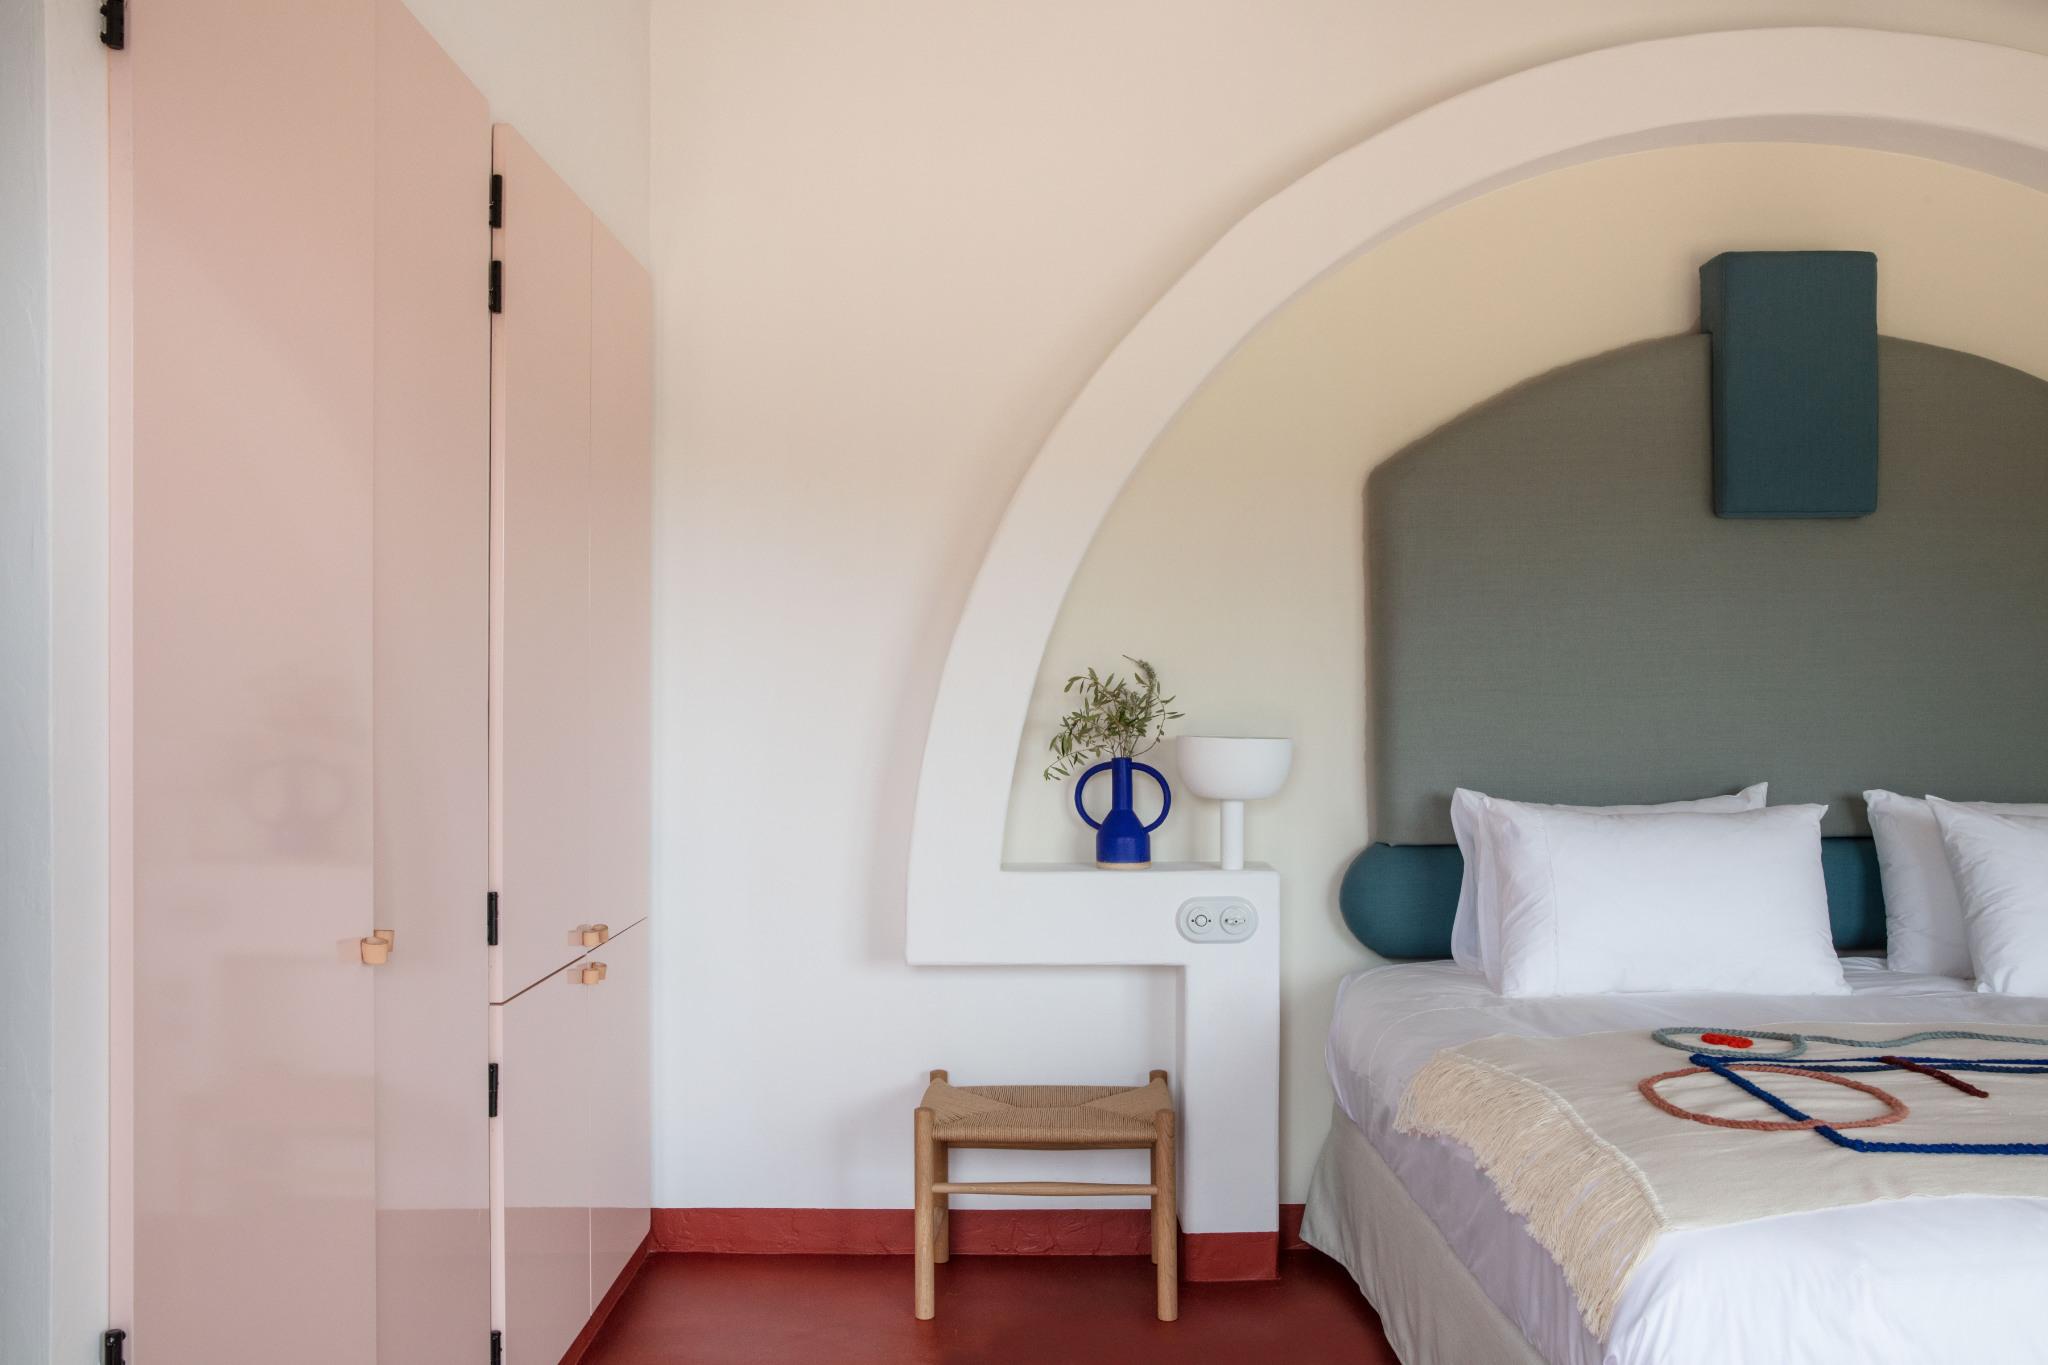 Habitación Son Bou 2 hotel experimental de Menorca